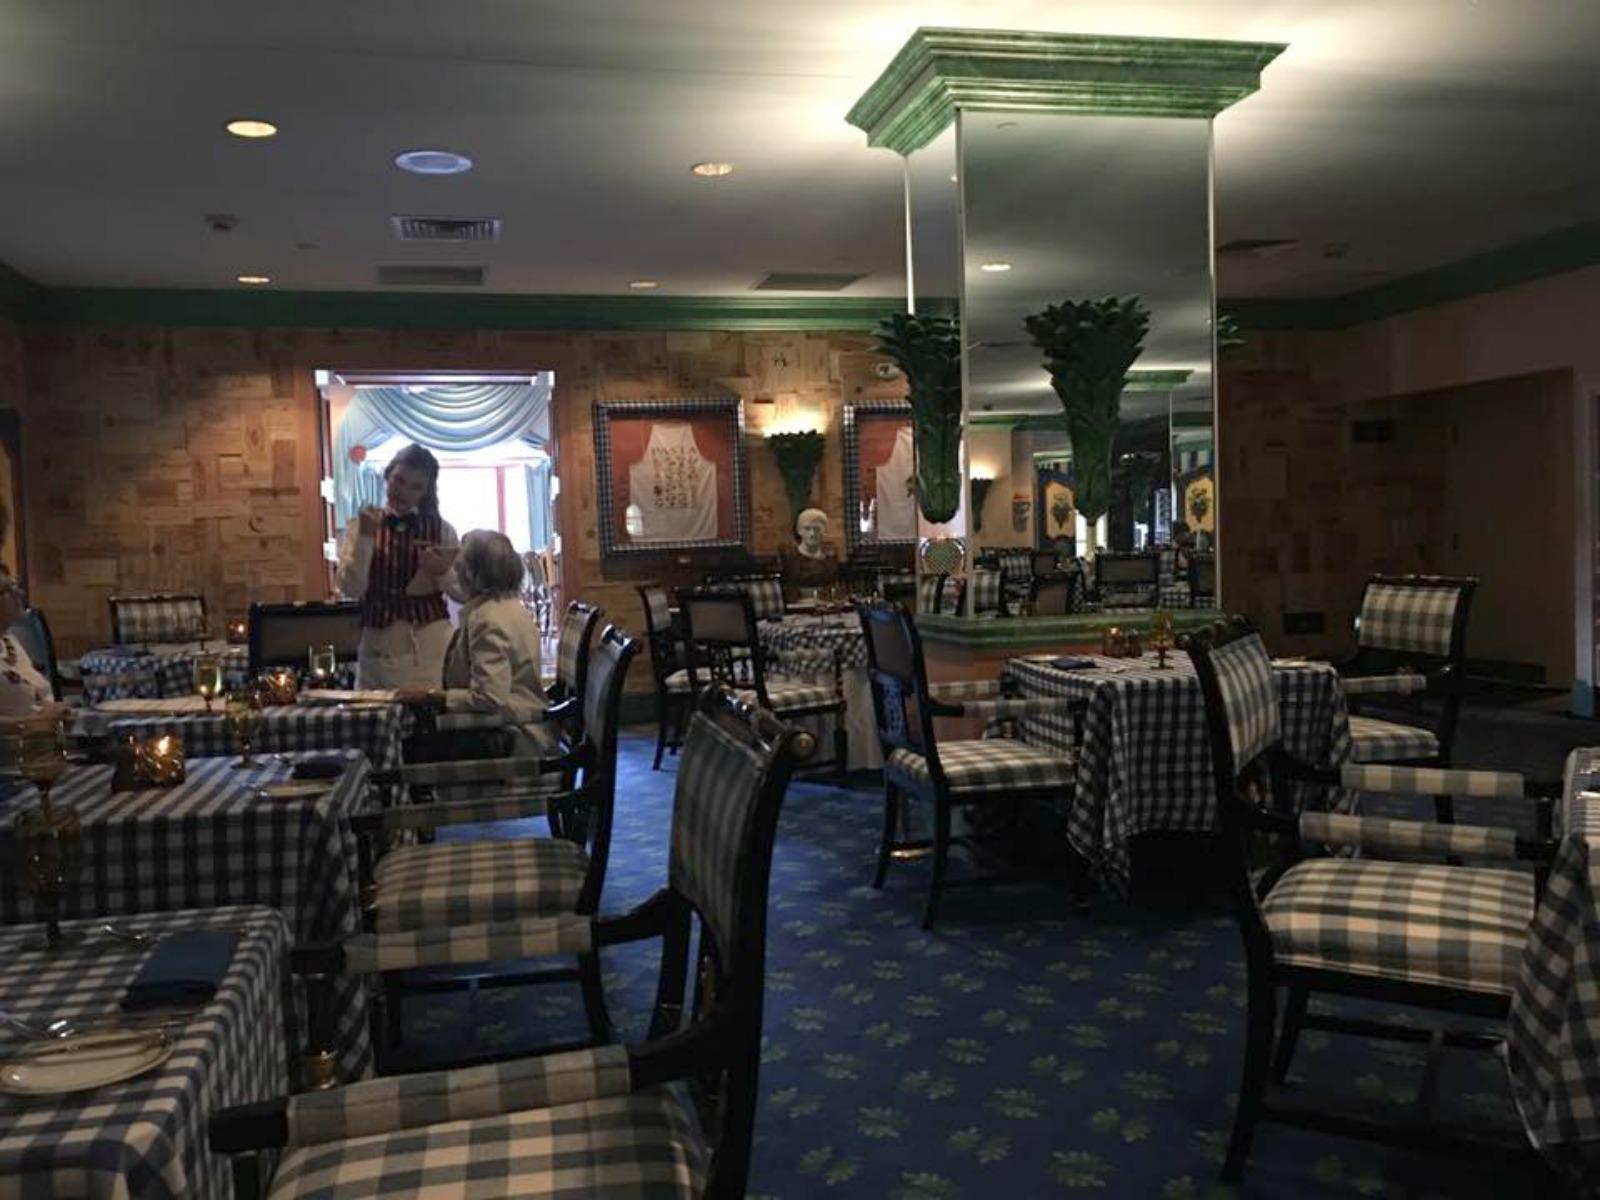 greenbrier resort, anniversary trip, forum